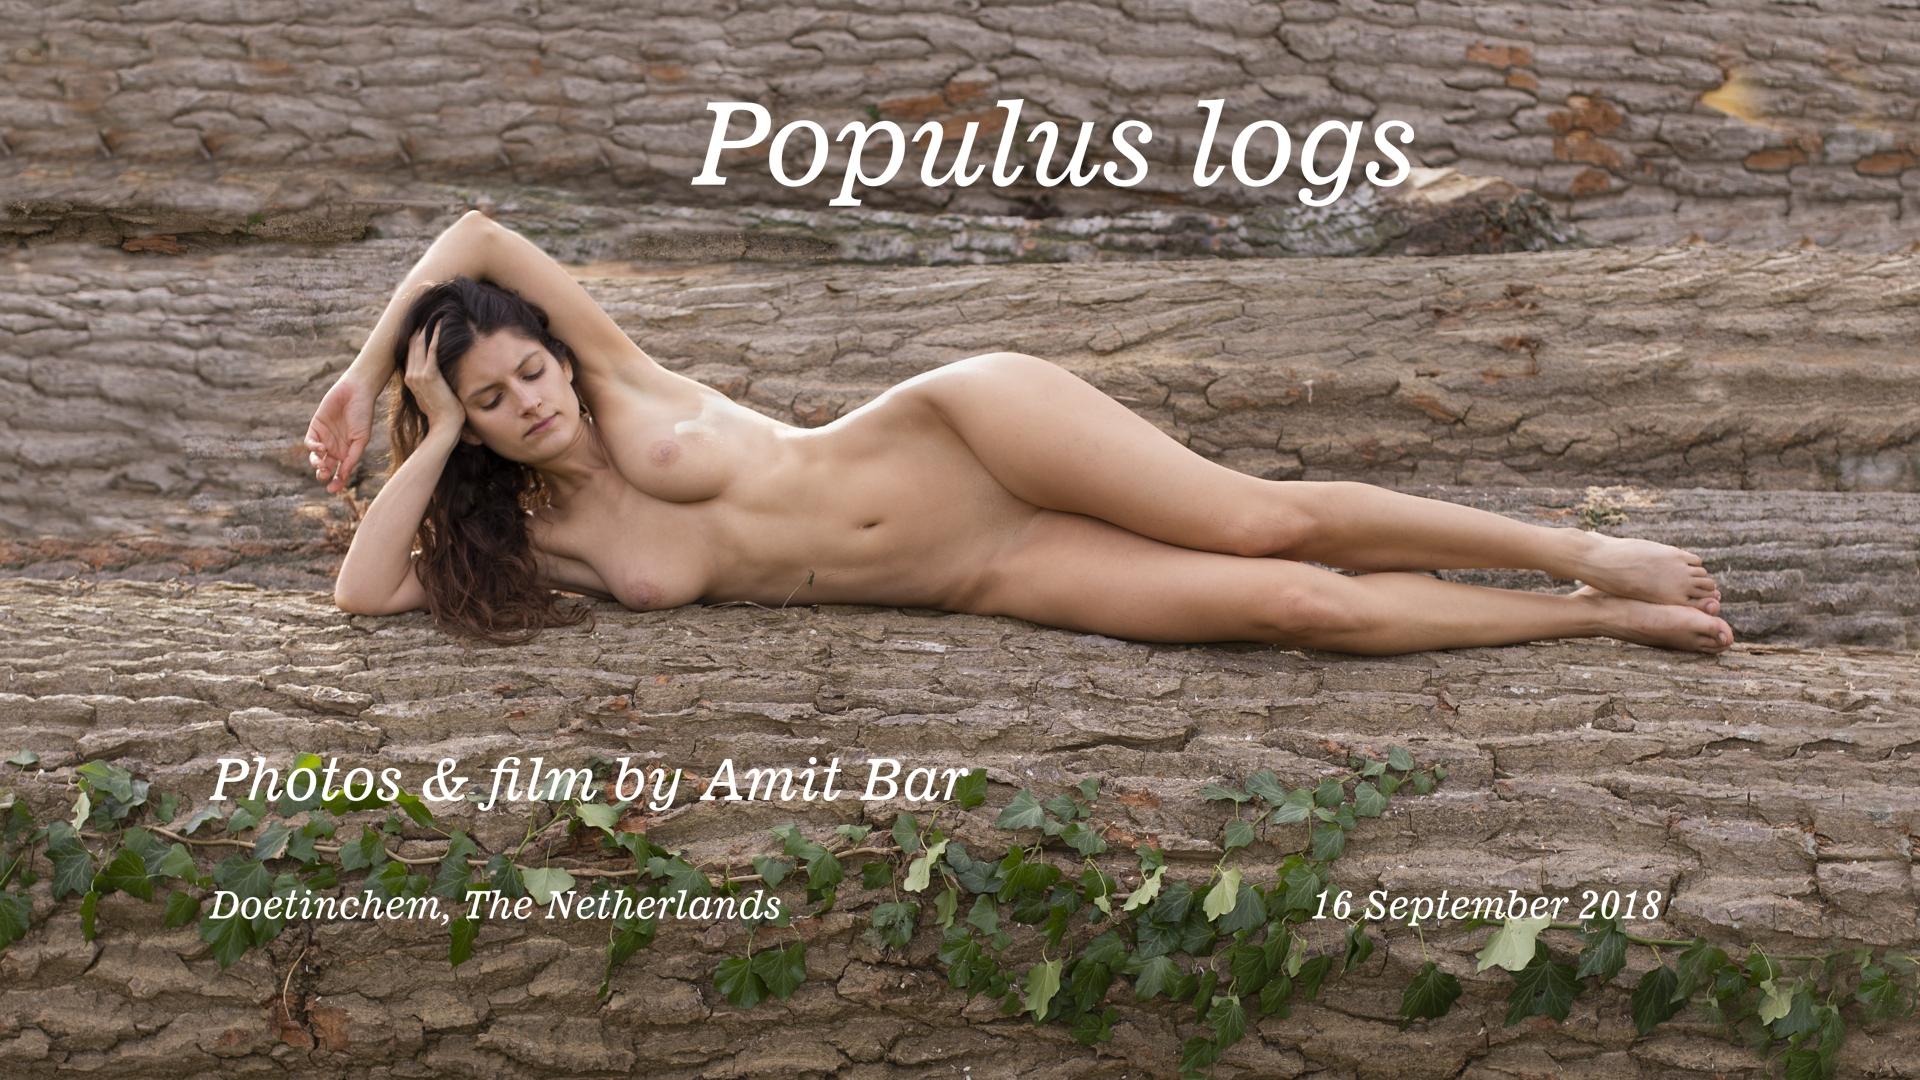 Populus logs video